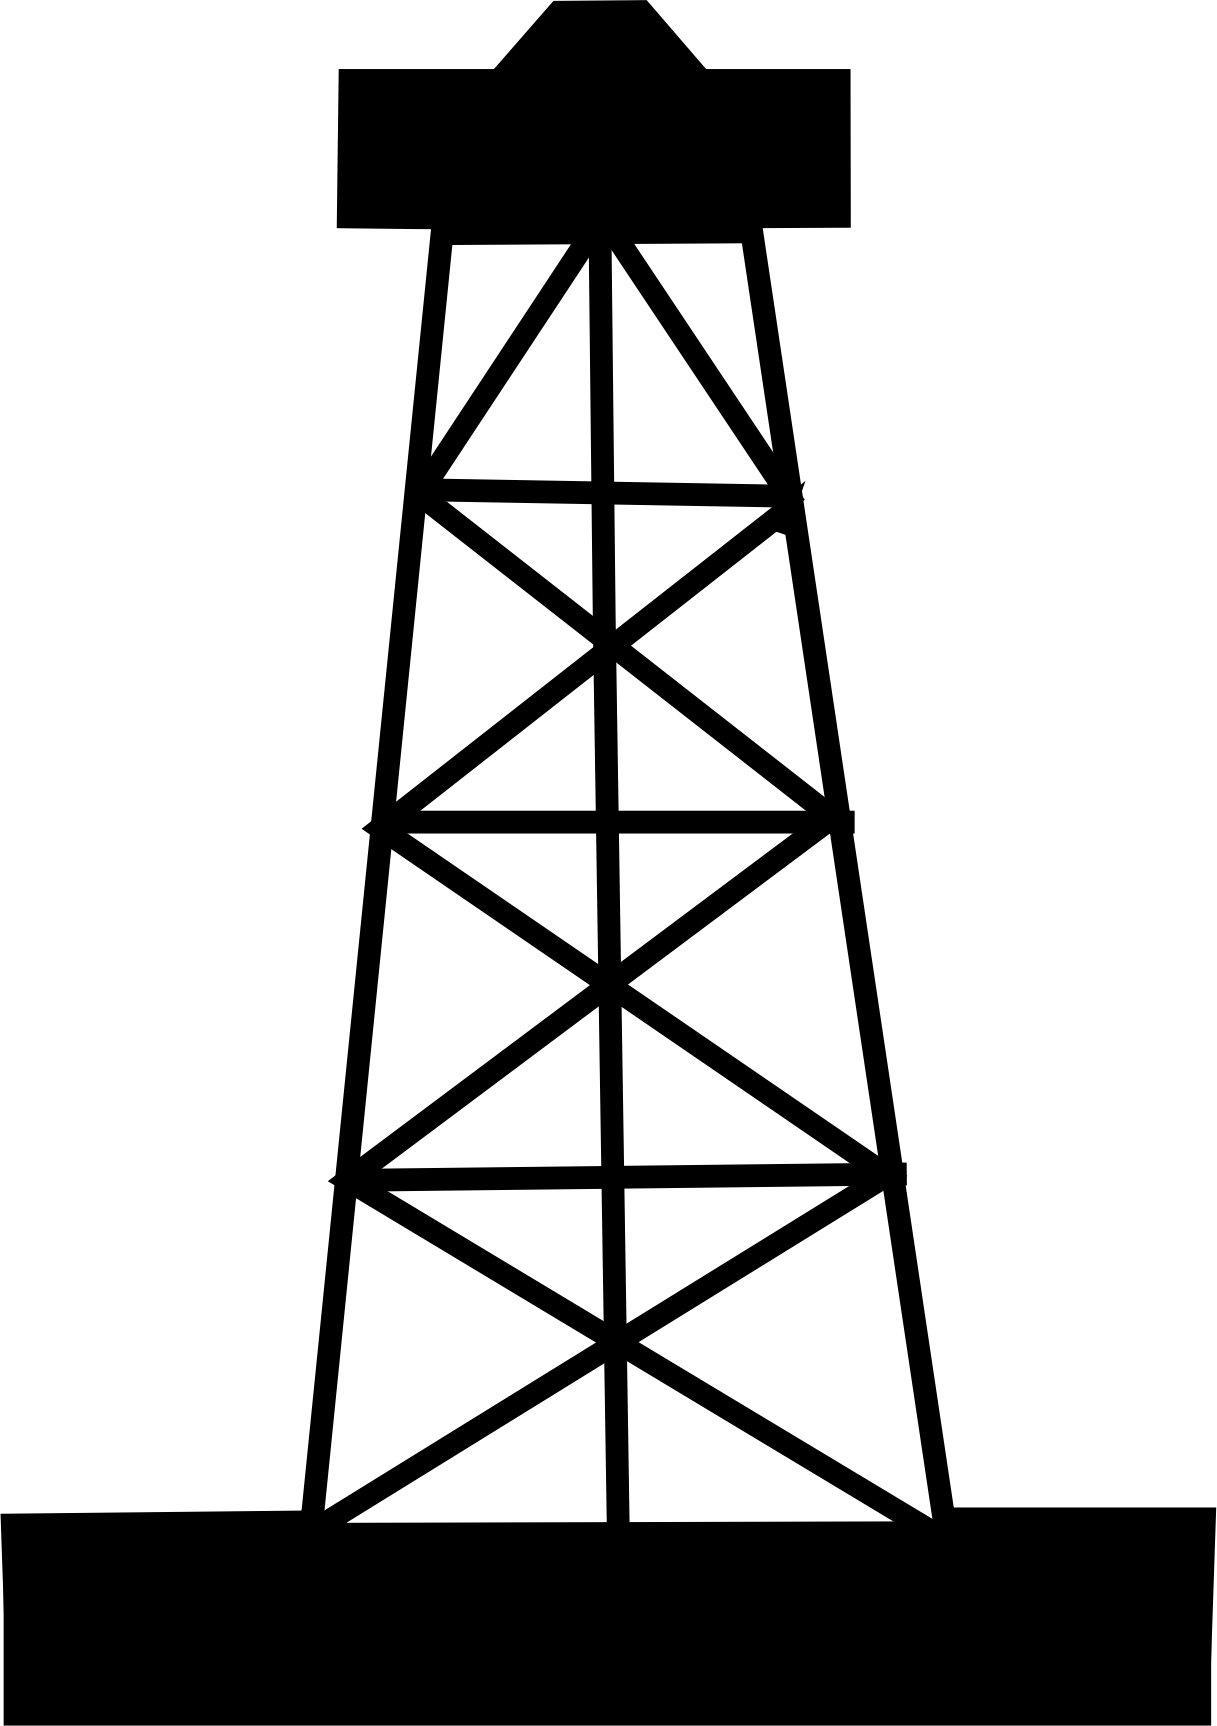 Field panda free images. Oil clipart symbol